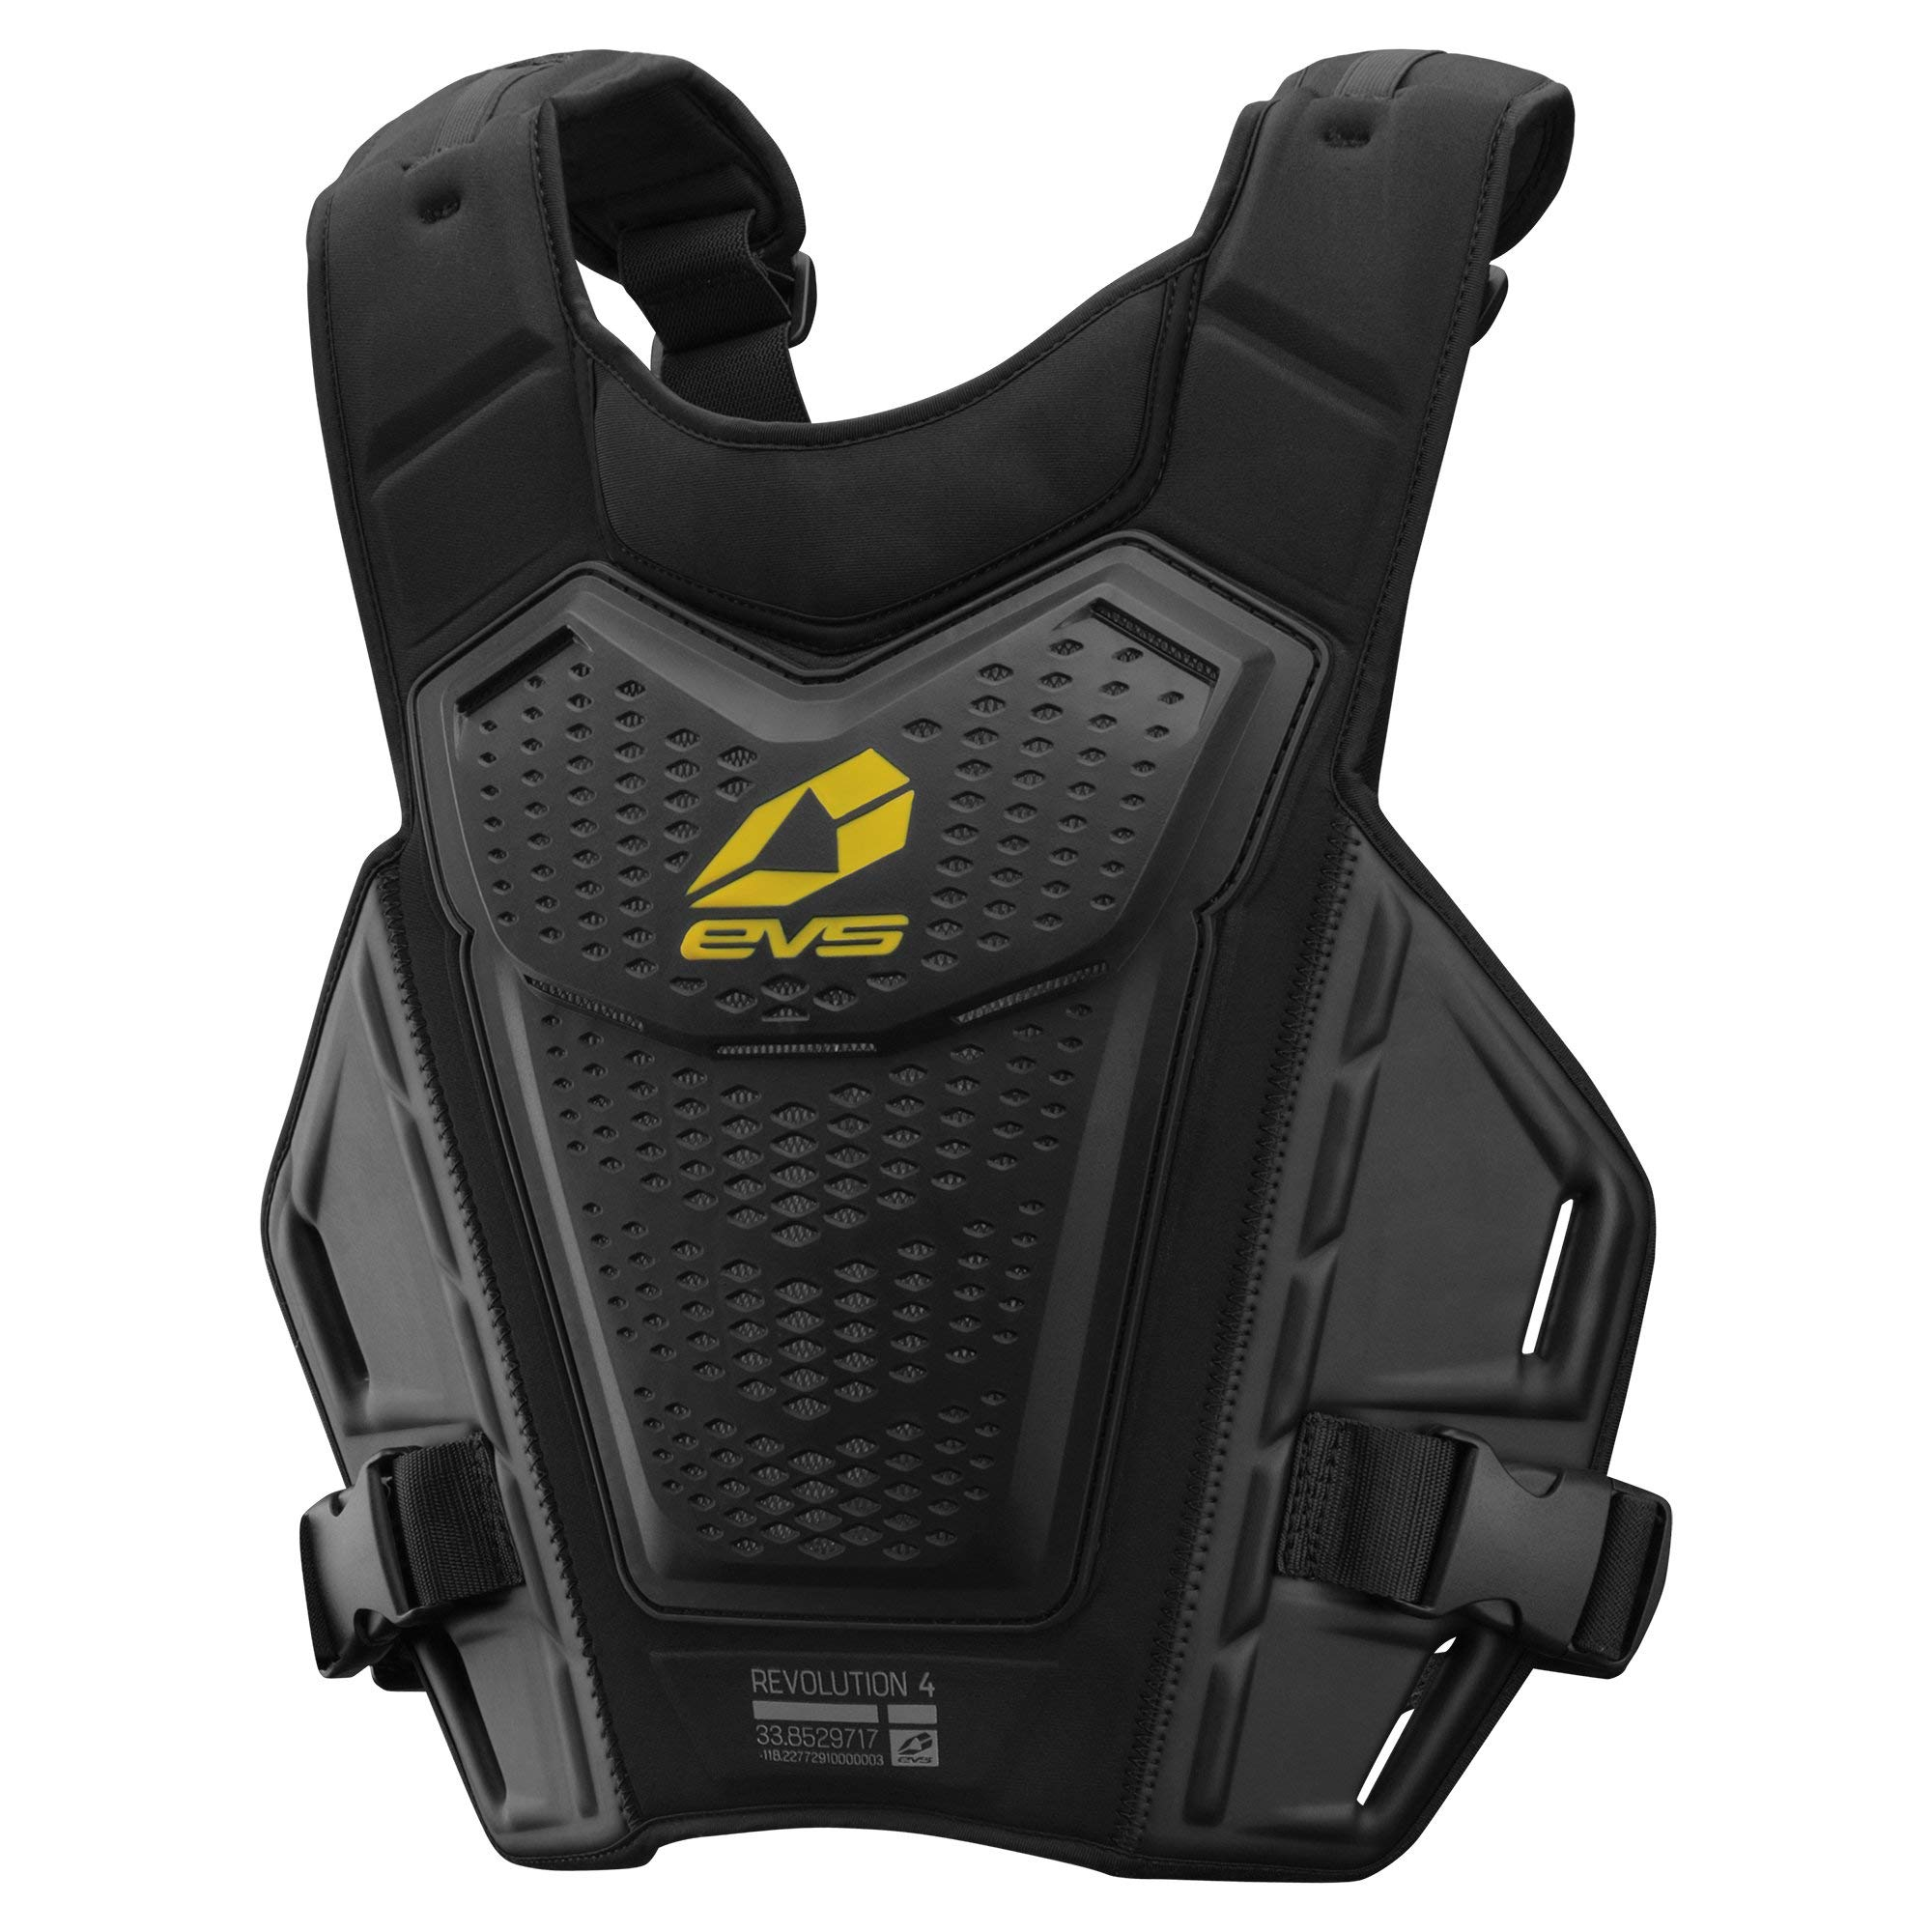 EVS Sports Men's Roost Deflector (REVO 4) (Black/Hi-Viz, Adult (L/XL)) by EVS Sports